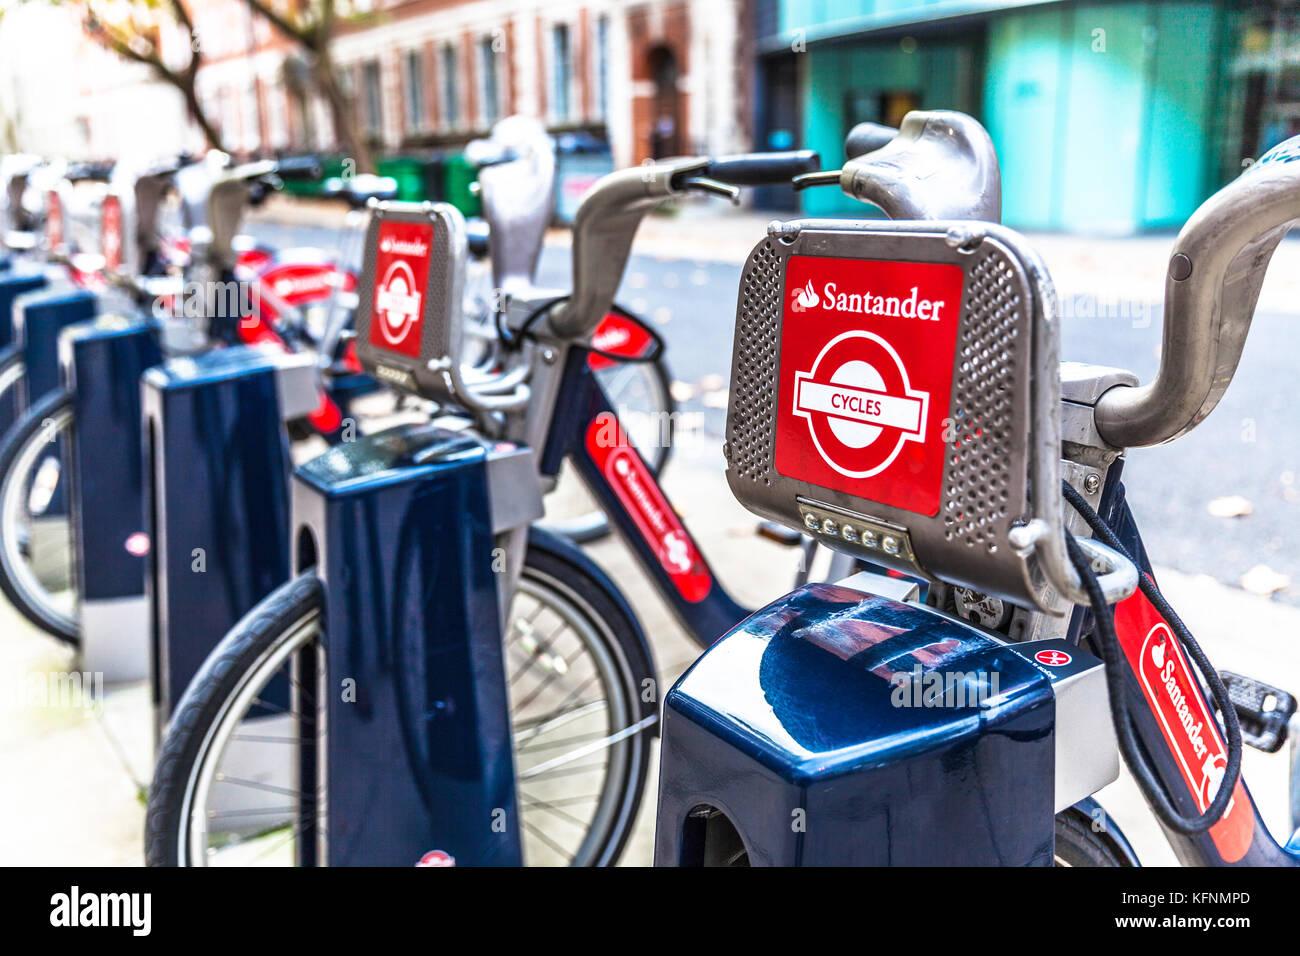 Santander cycles docking station, London, England, UK. - Stock Image